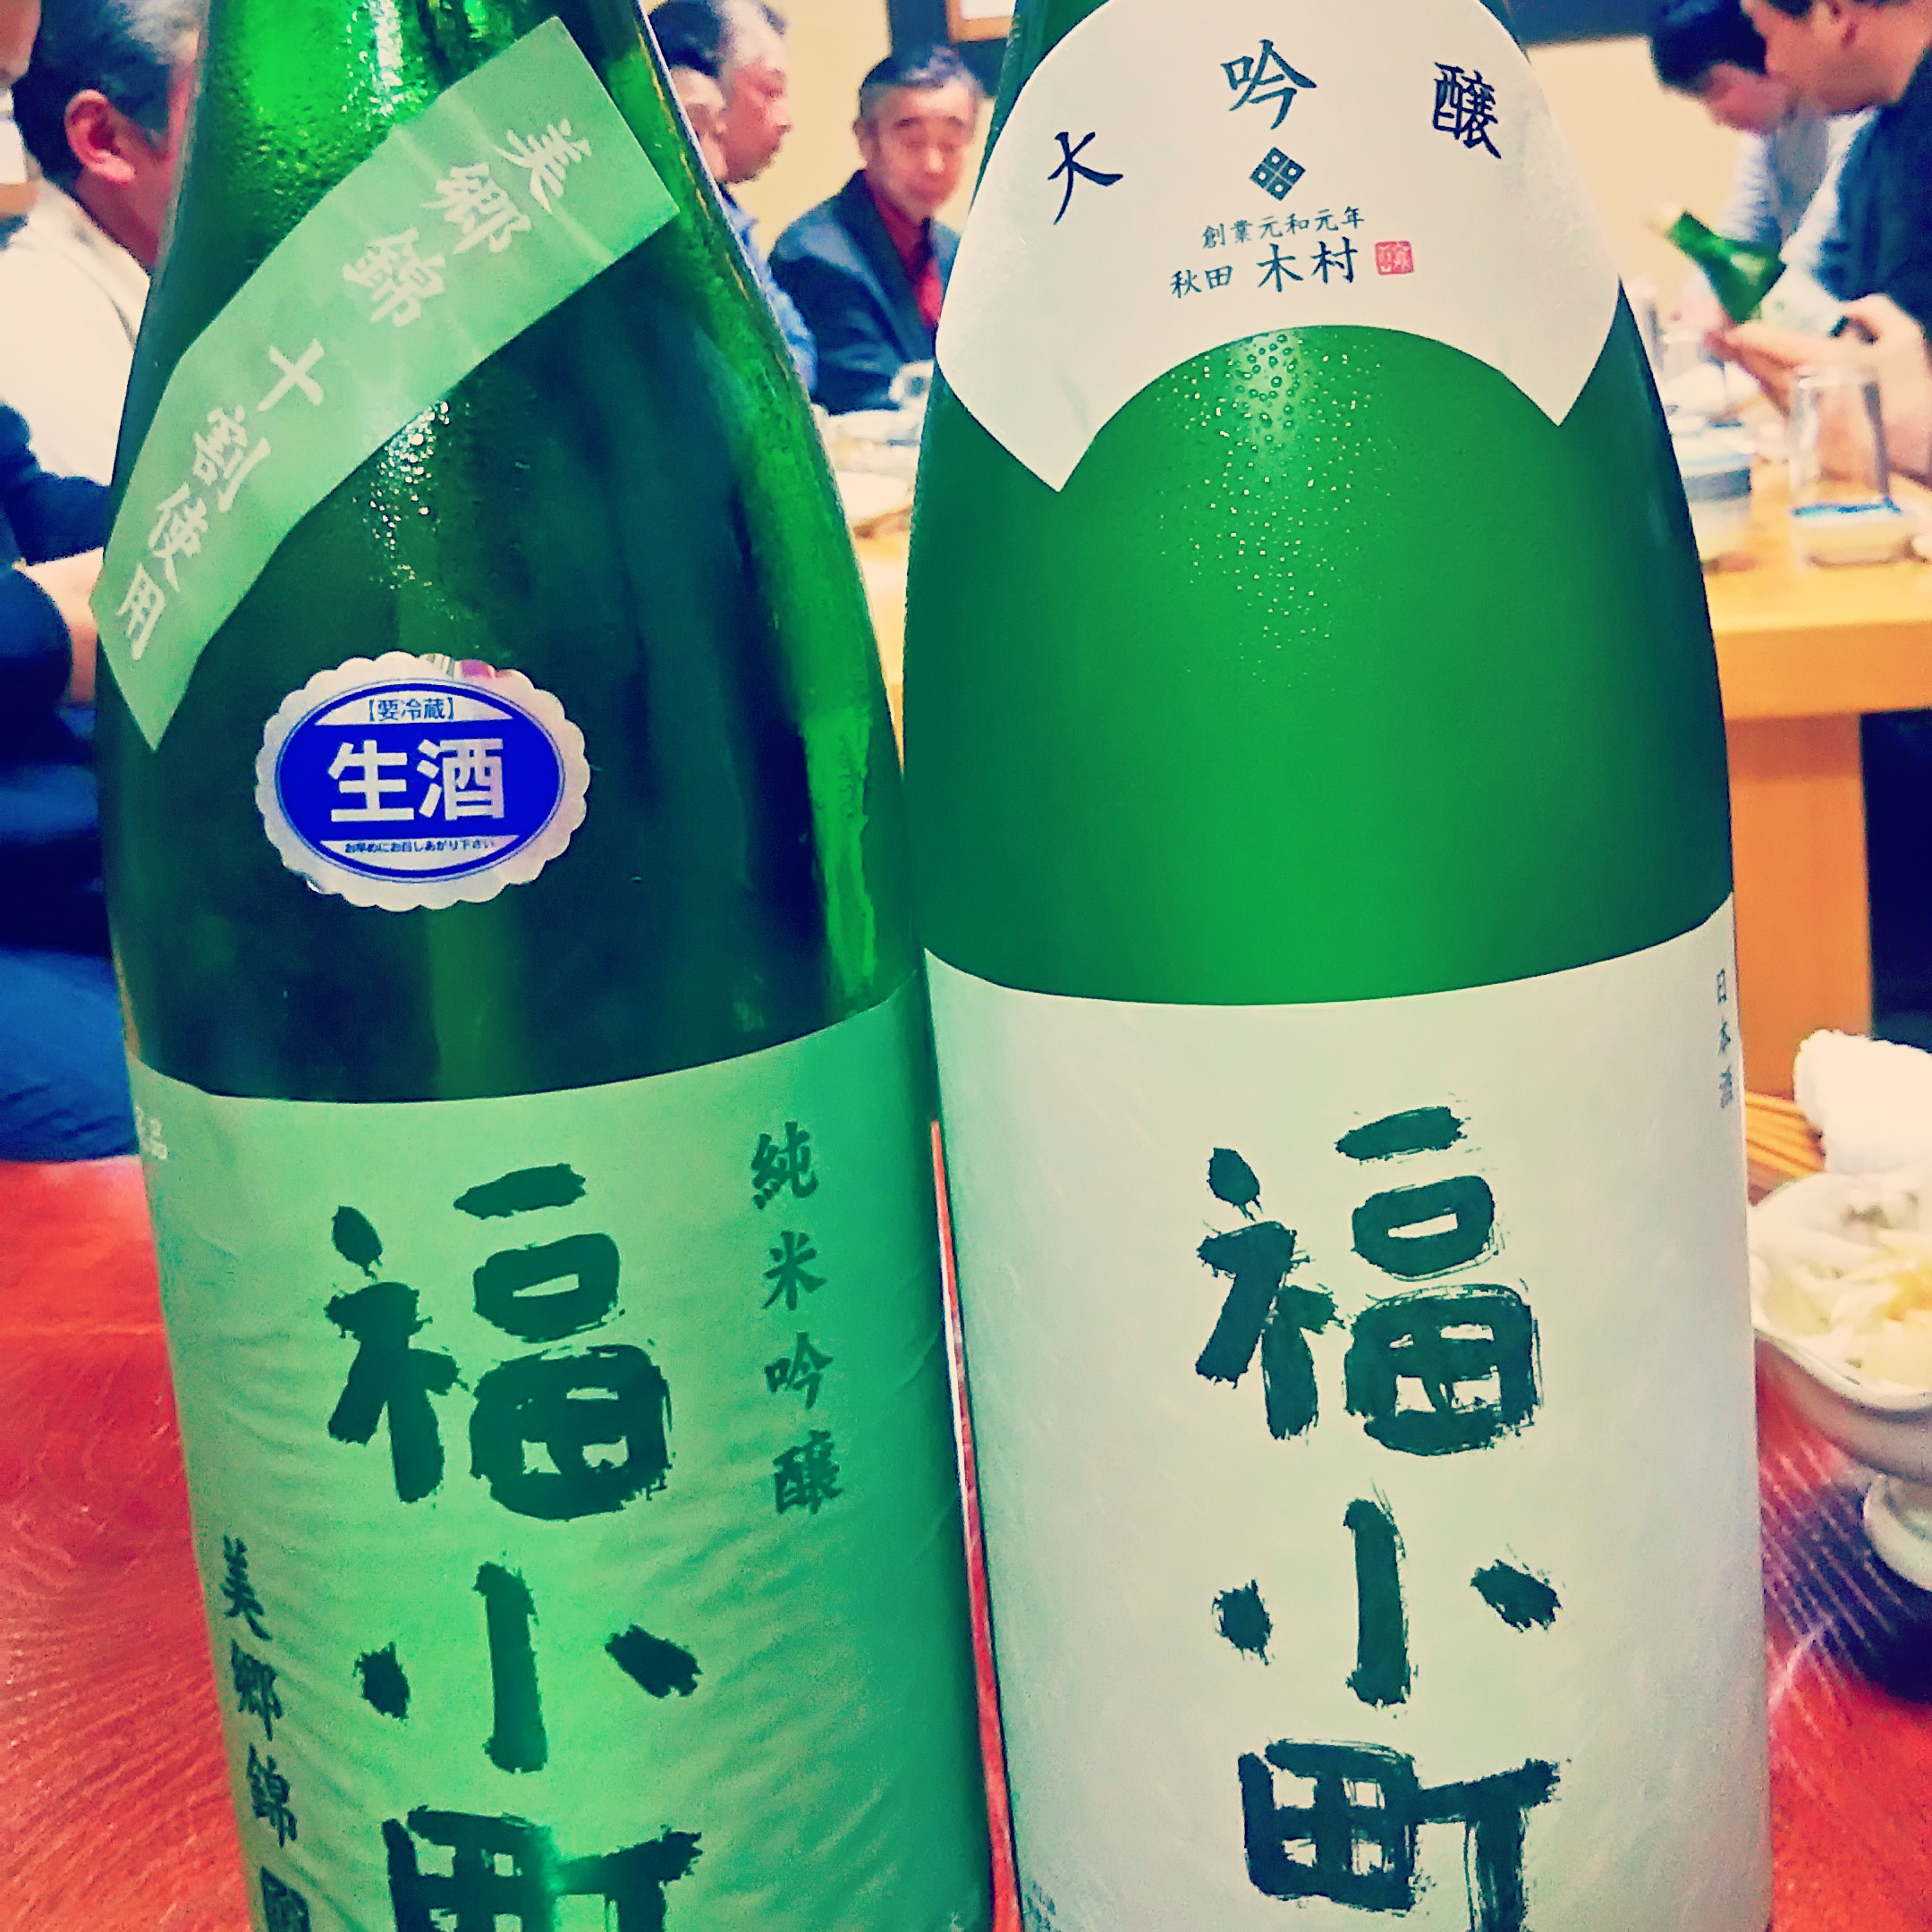 http://www.fukukomachi.com/blog/photo/IMG_20170405_211144_175.jpg